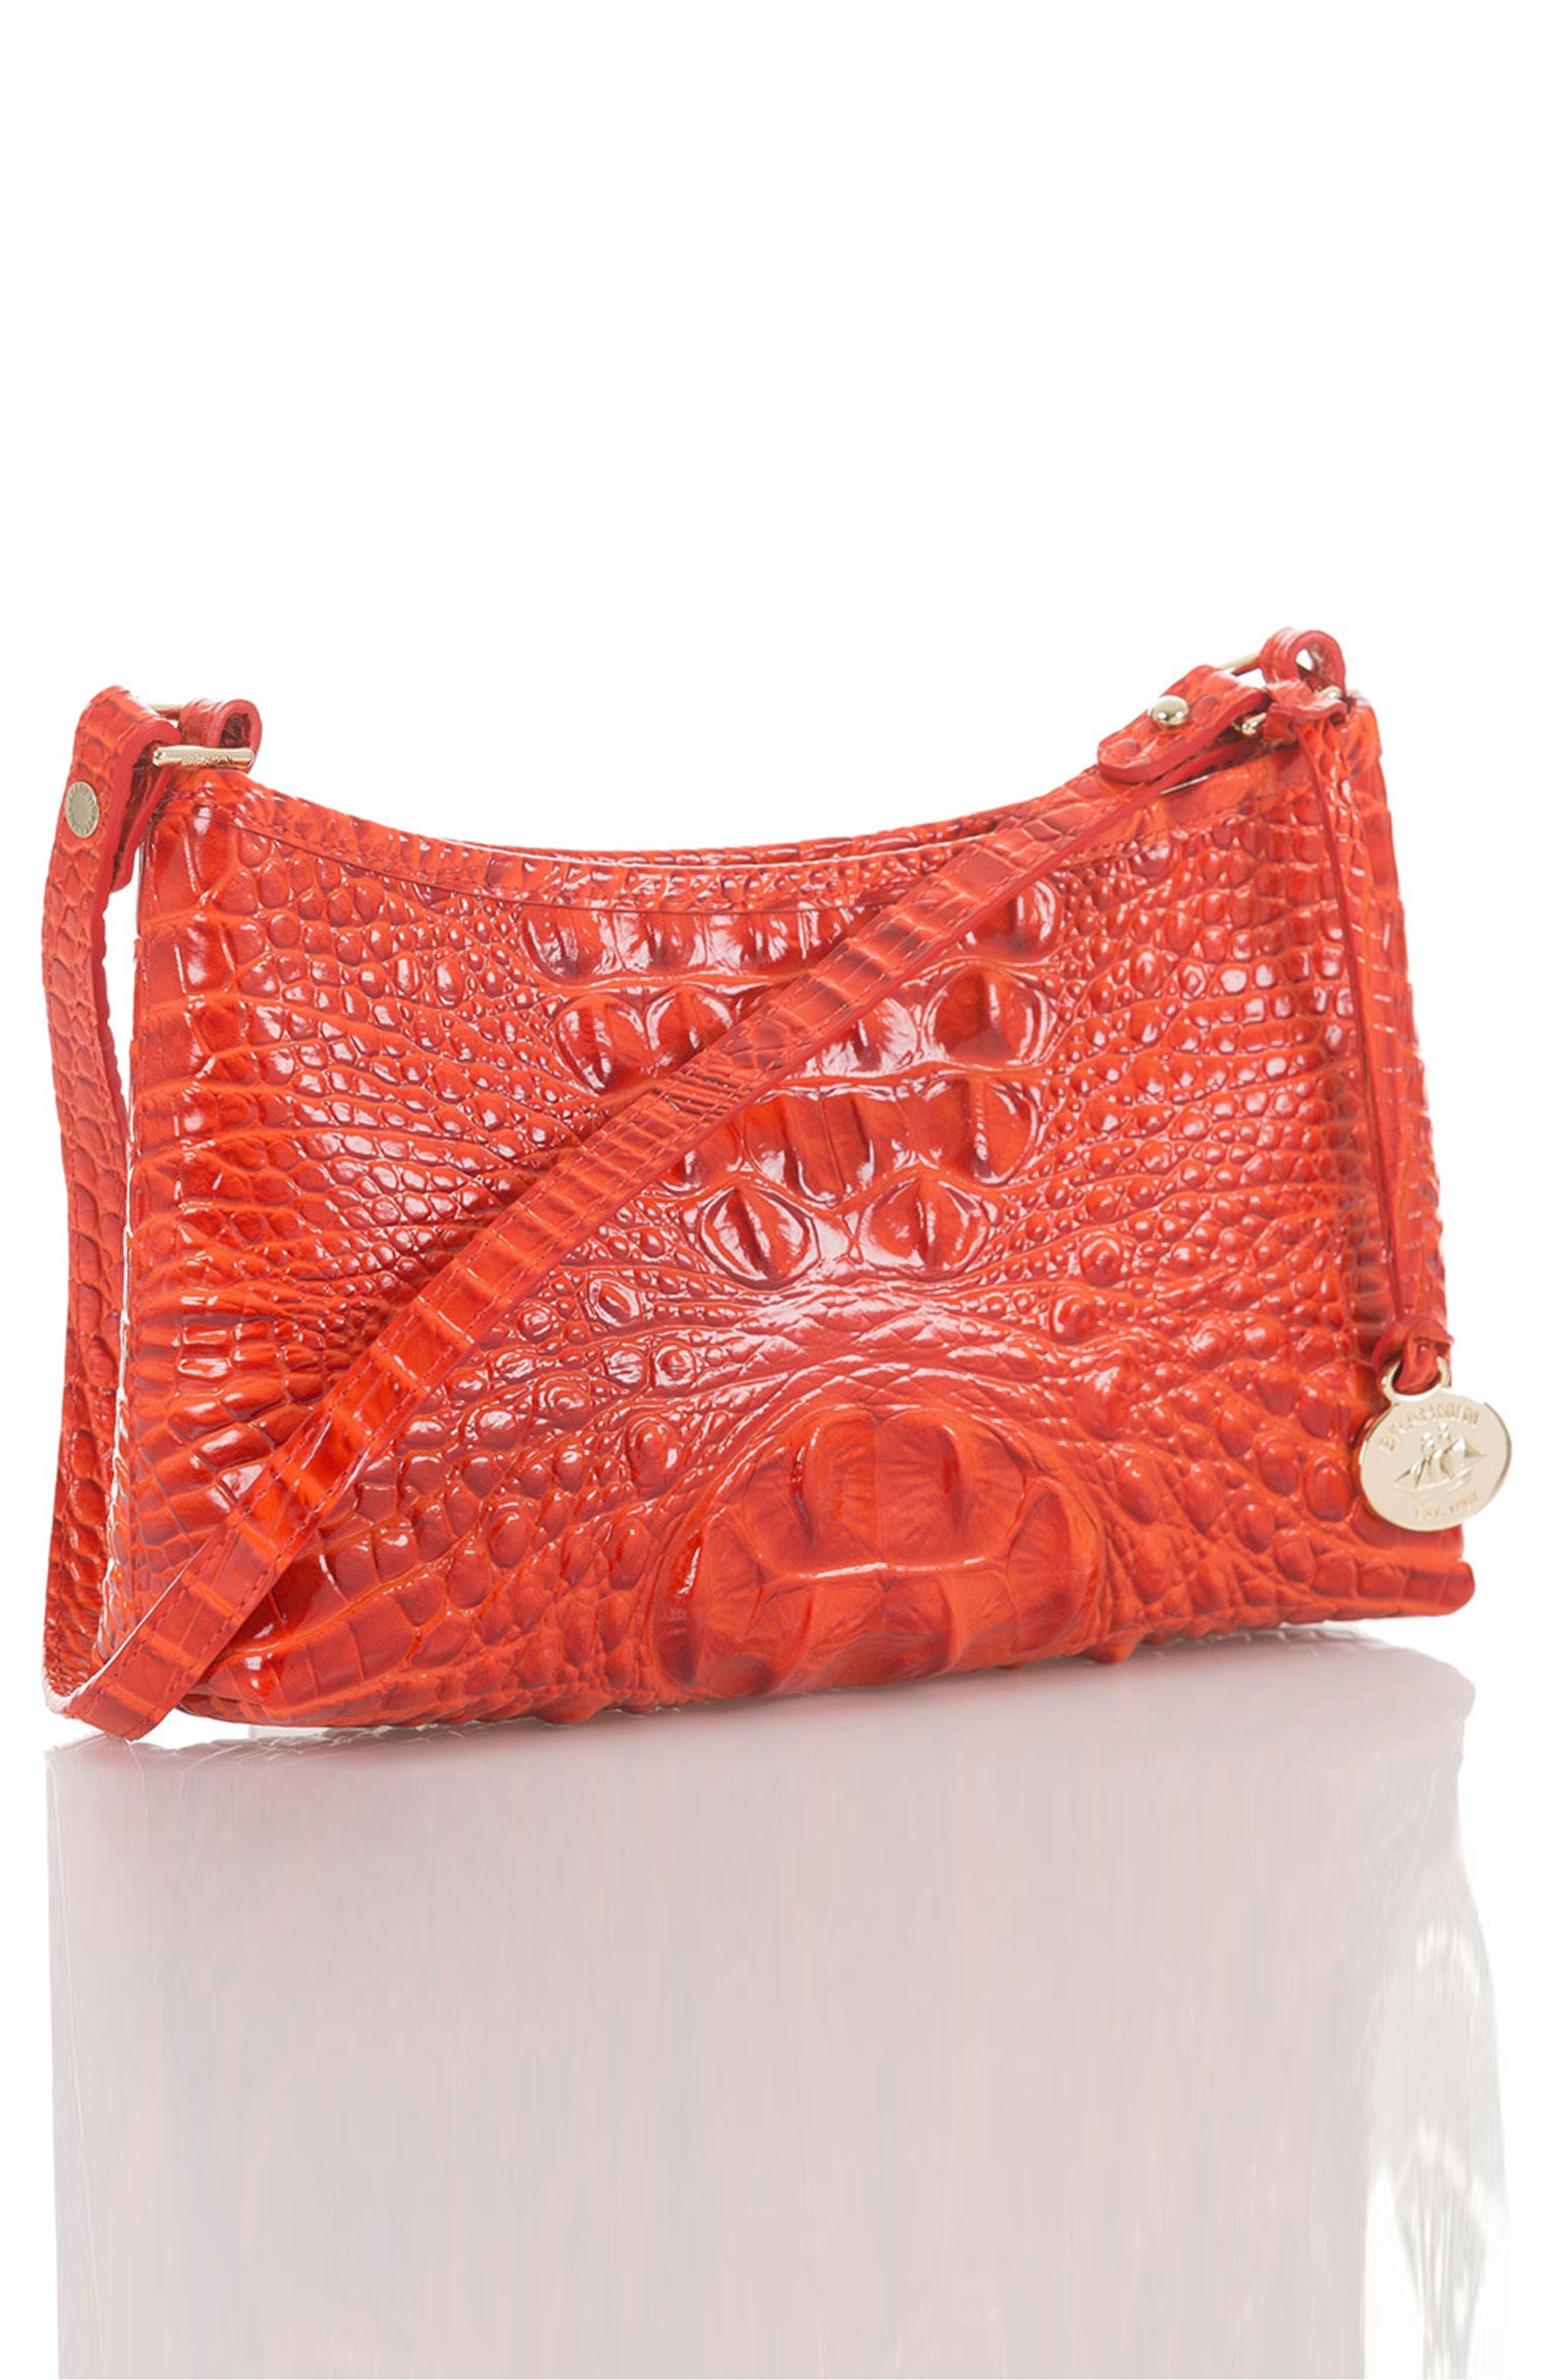 'Anytime - Mini' Convertible Handbag,                             Alternate thumbnail 73, color,